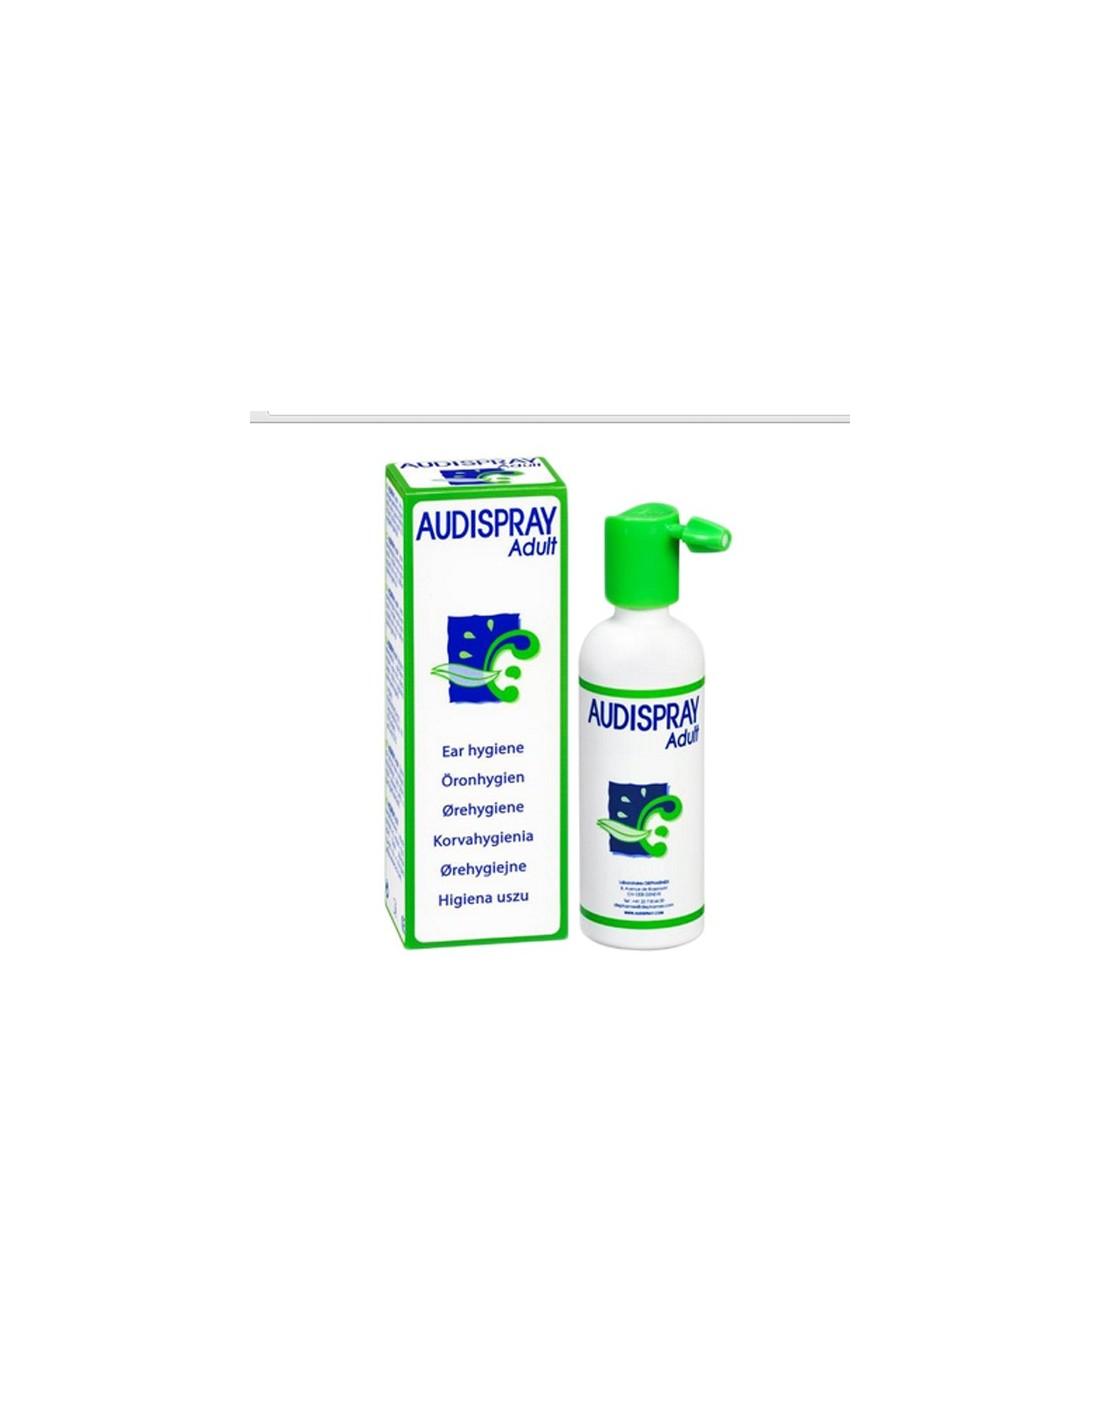 AUDISPRAY ADULT LIMPIEZA OIDOS 50 ML